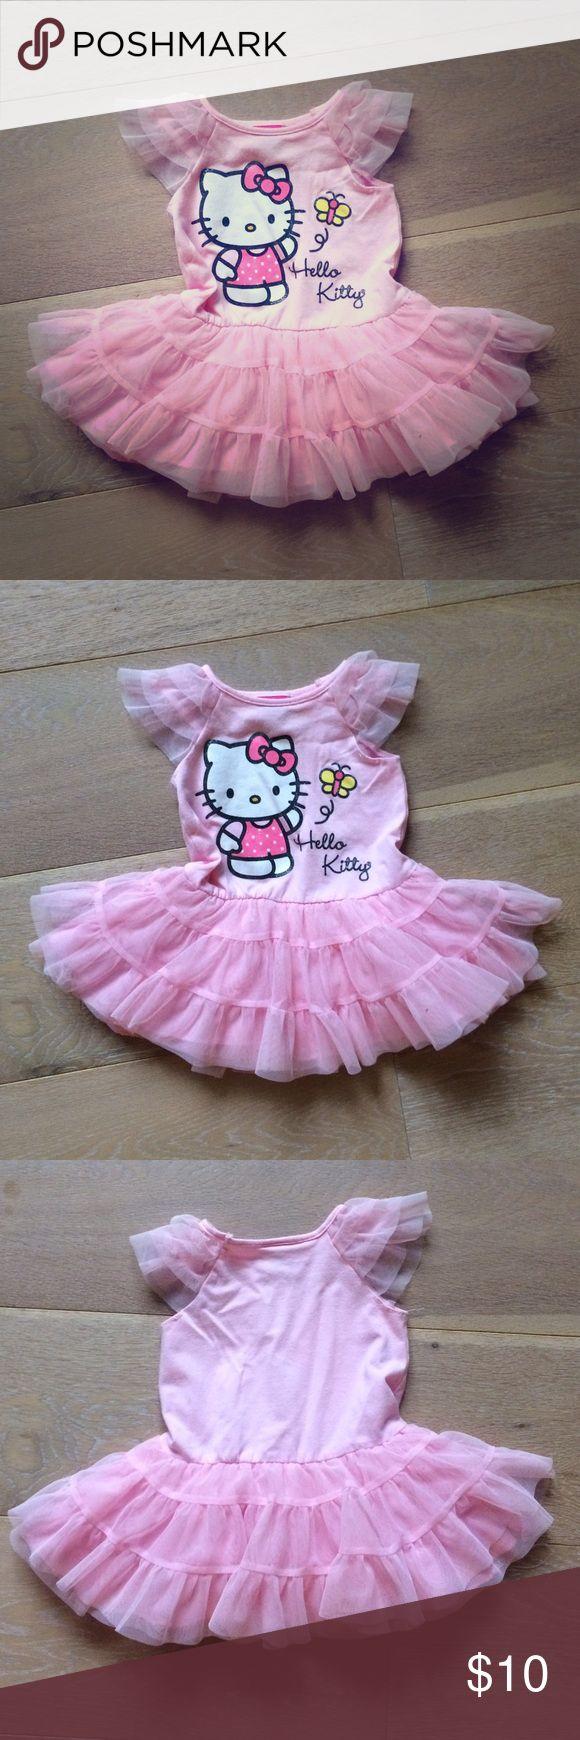 🎉🎉SALE🎉🎉 Hello Kitty tutu dress Fun Hello Kitty tutu dress. 3 layers in the tutu. Great condition! Hello Kitty Dresses